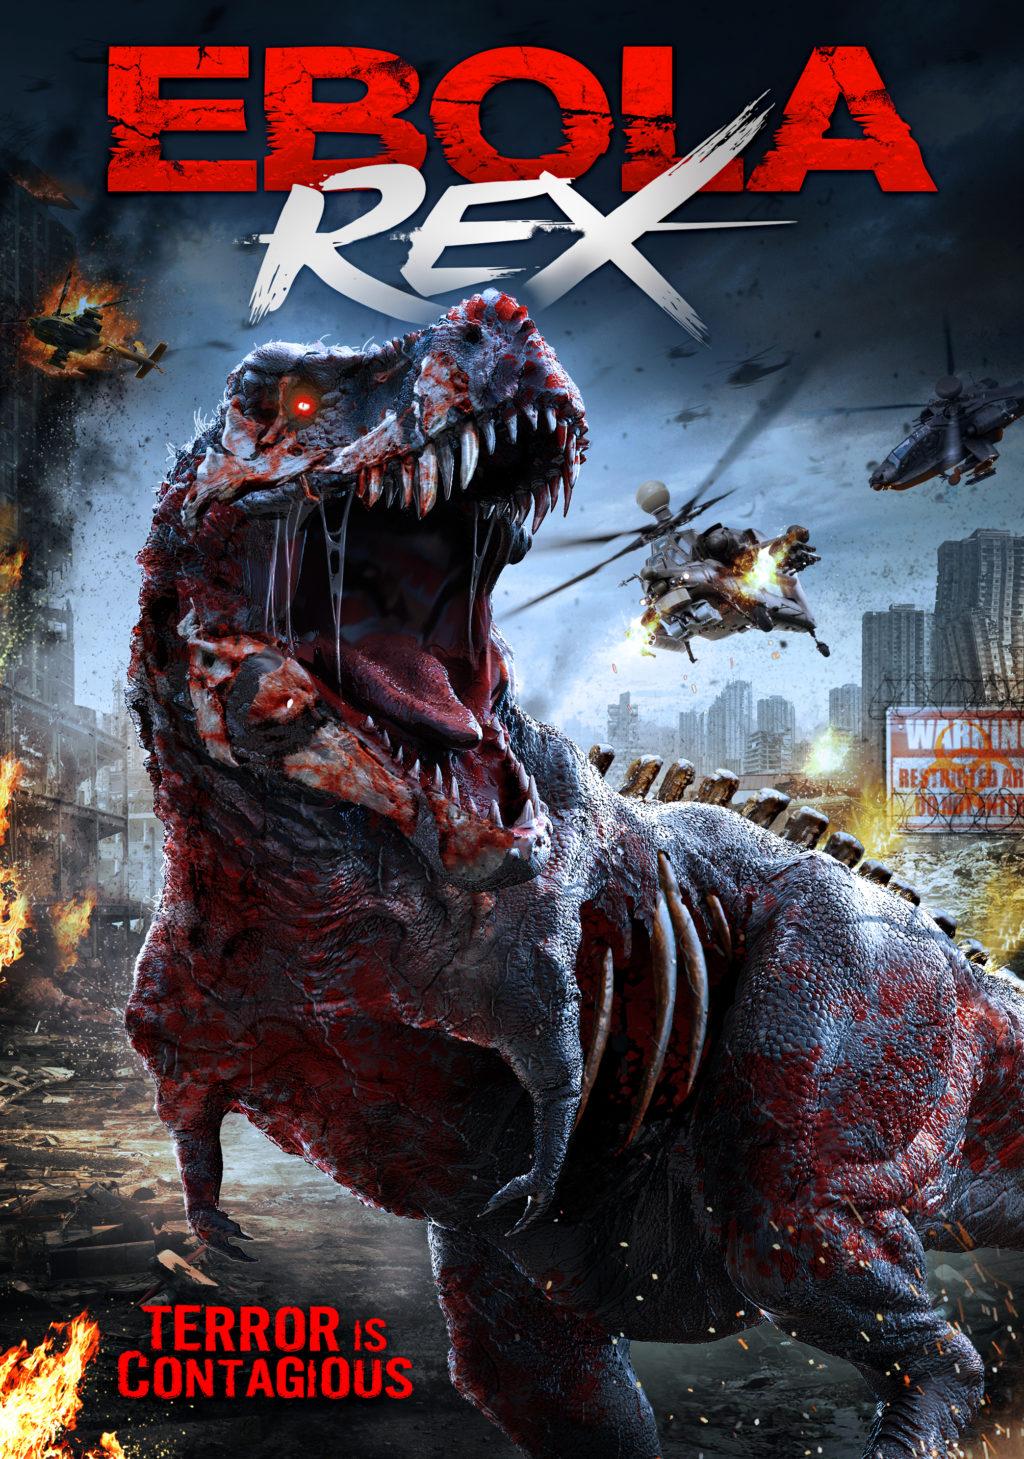 Ebola Rex Sneak Peek